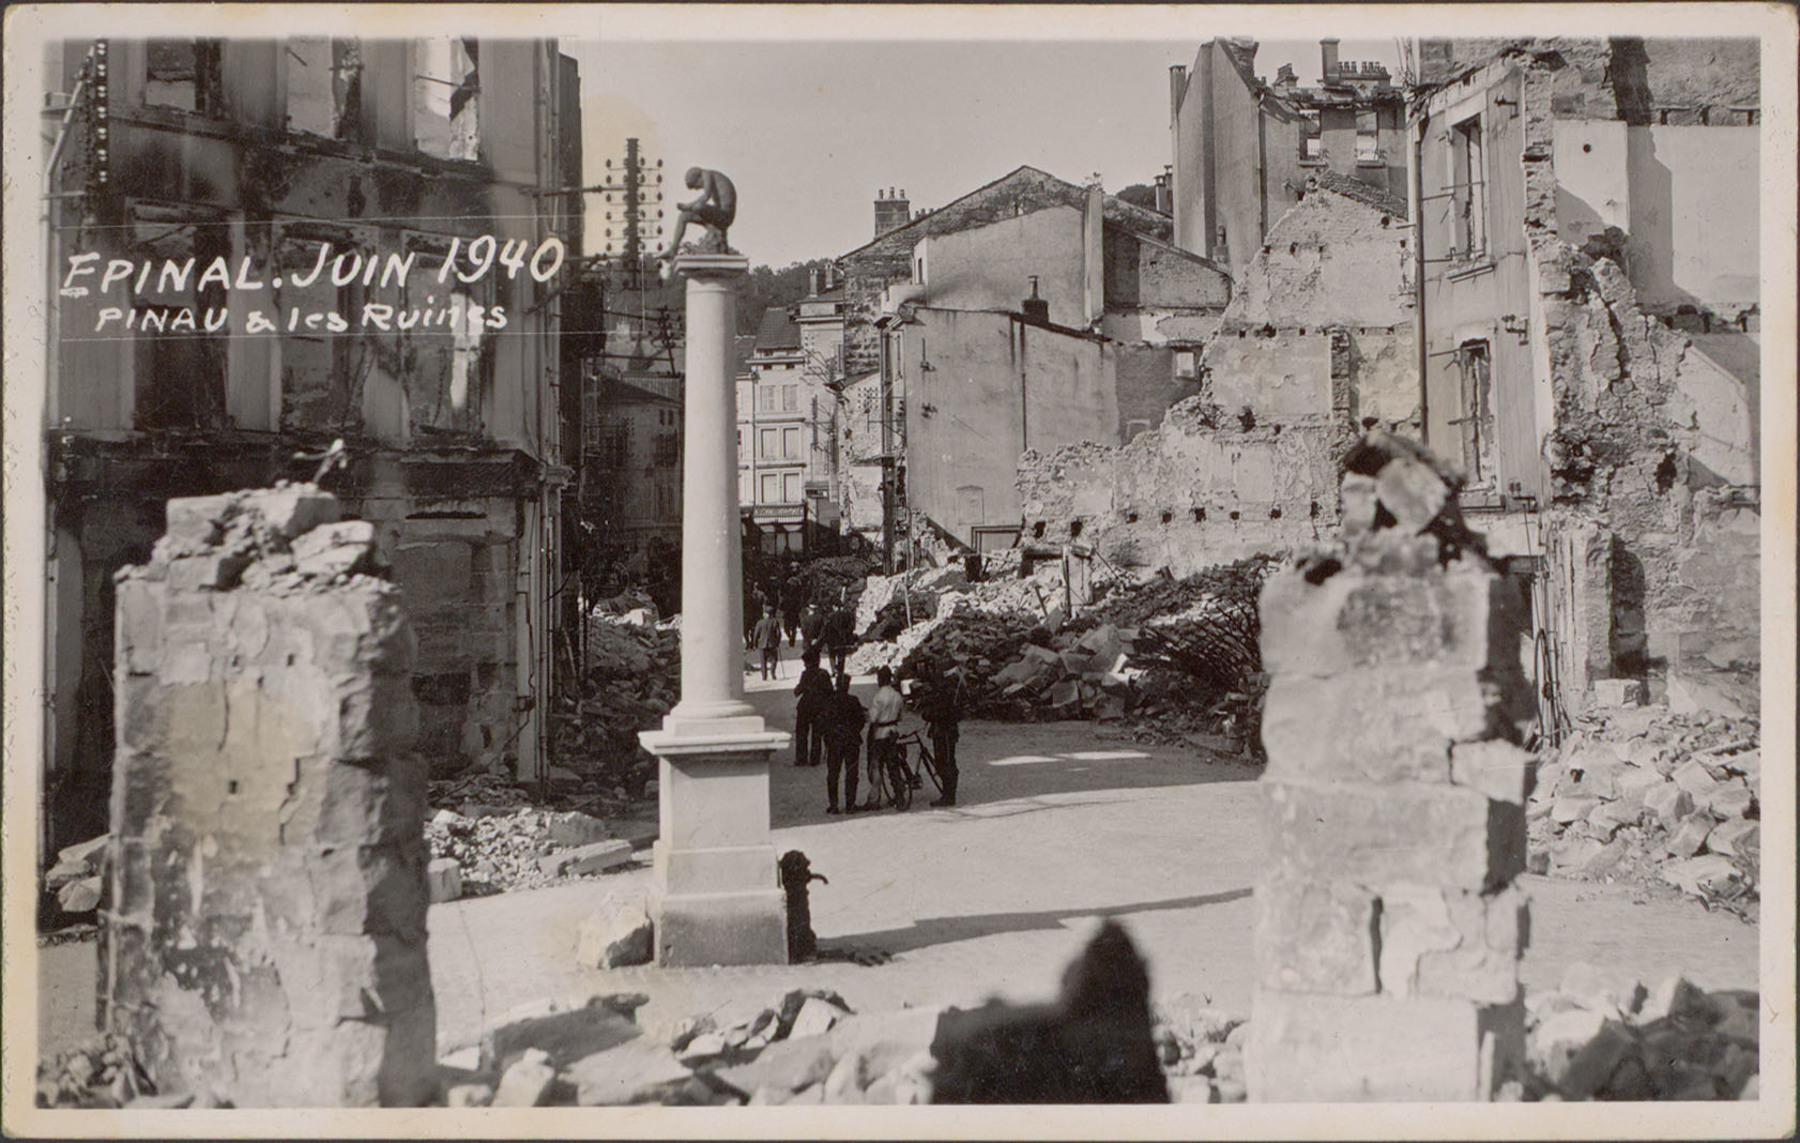 Contenu du Épinal, Juin 1940, Pinau & les Ruines